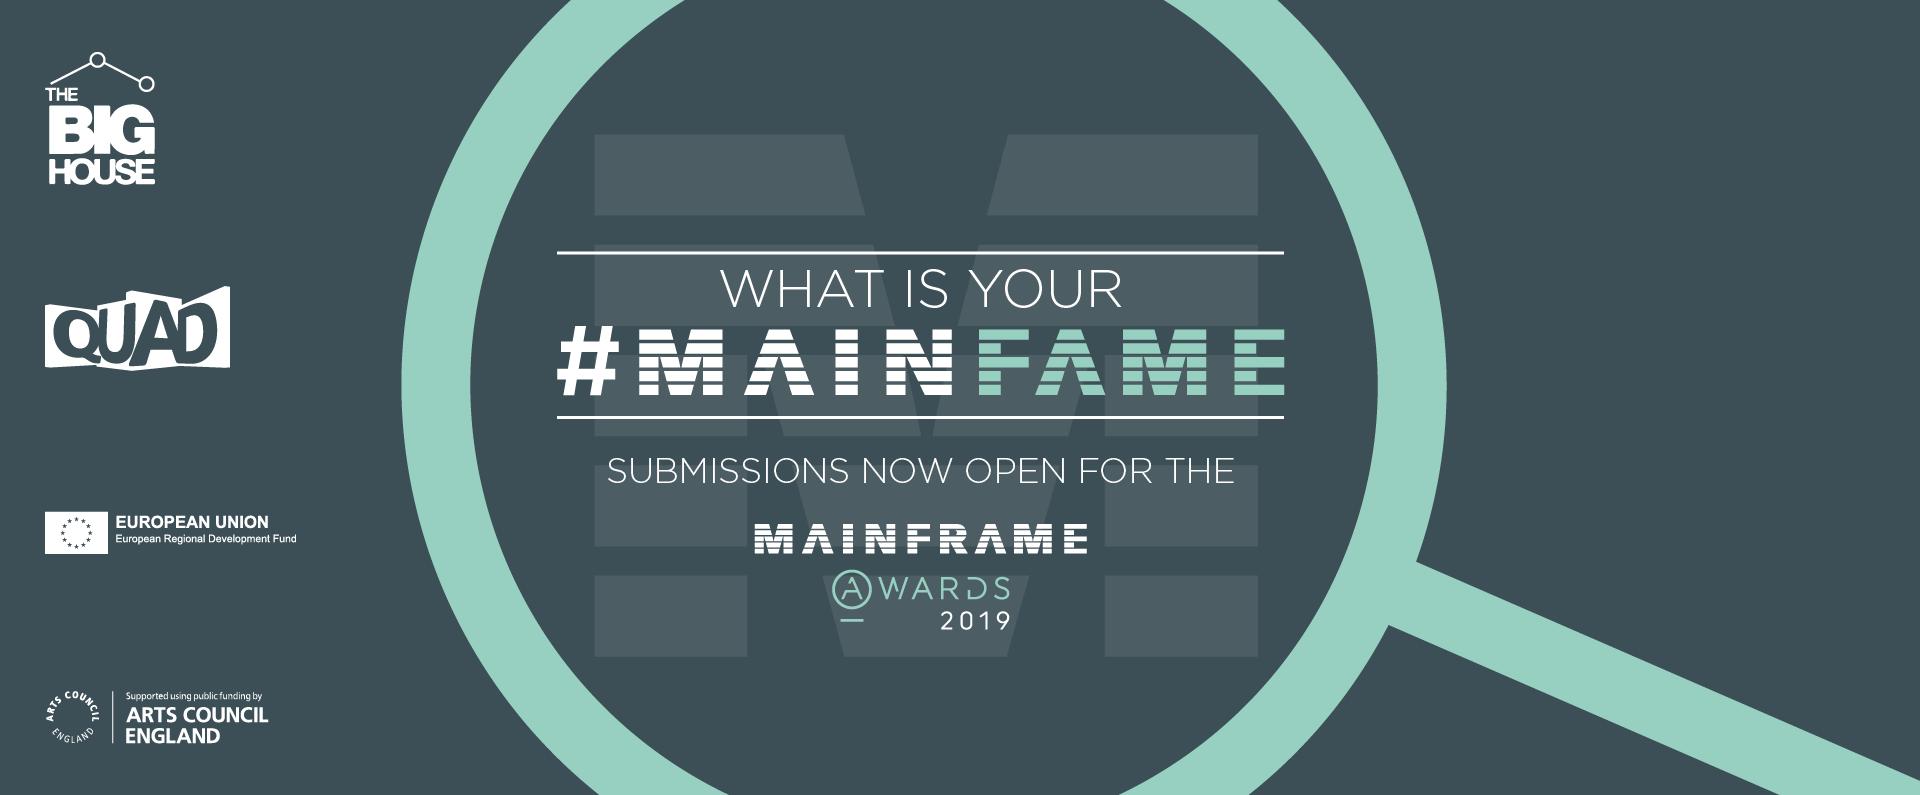 mainframe-website-headers-01-2-2